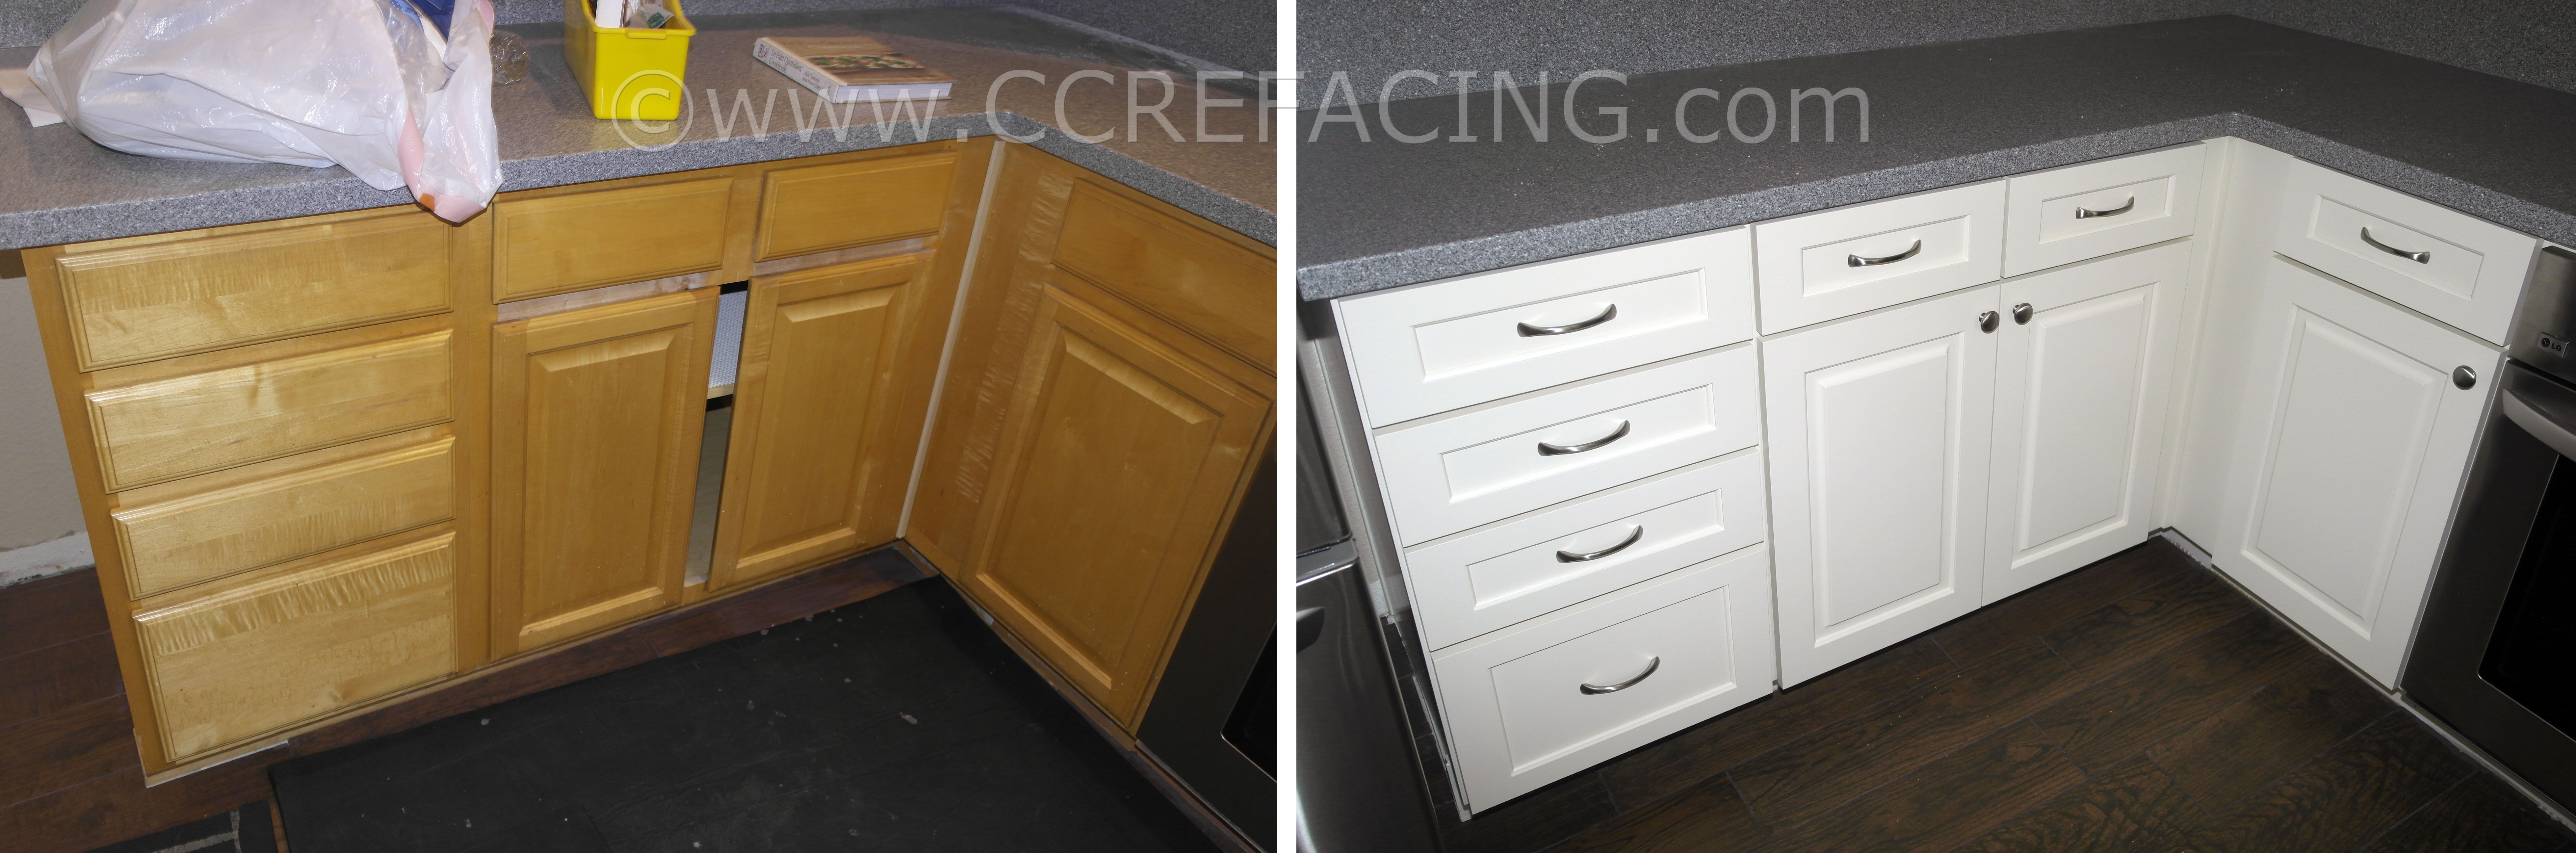 Inspirational Raised Panel Kitchen Cabinet Doors